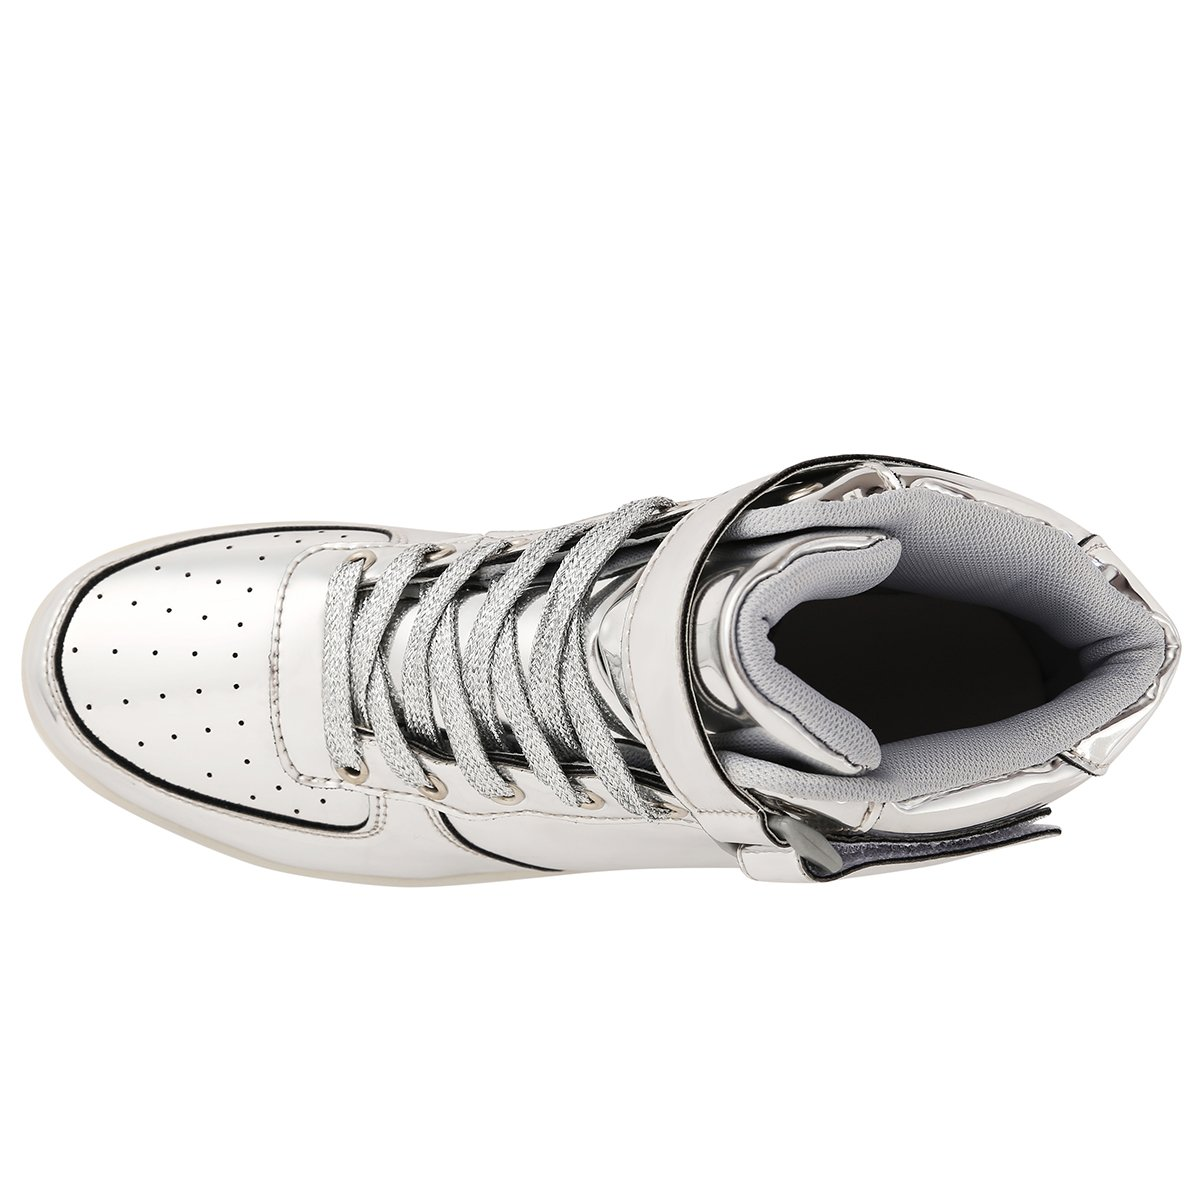 b07e1c3b1326ca Amazon.com  ANLUKE Kids High Top Light Up LED Shoes 11 Colors Sneakers as  Gift for Boys Girls Men Women  Shoes